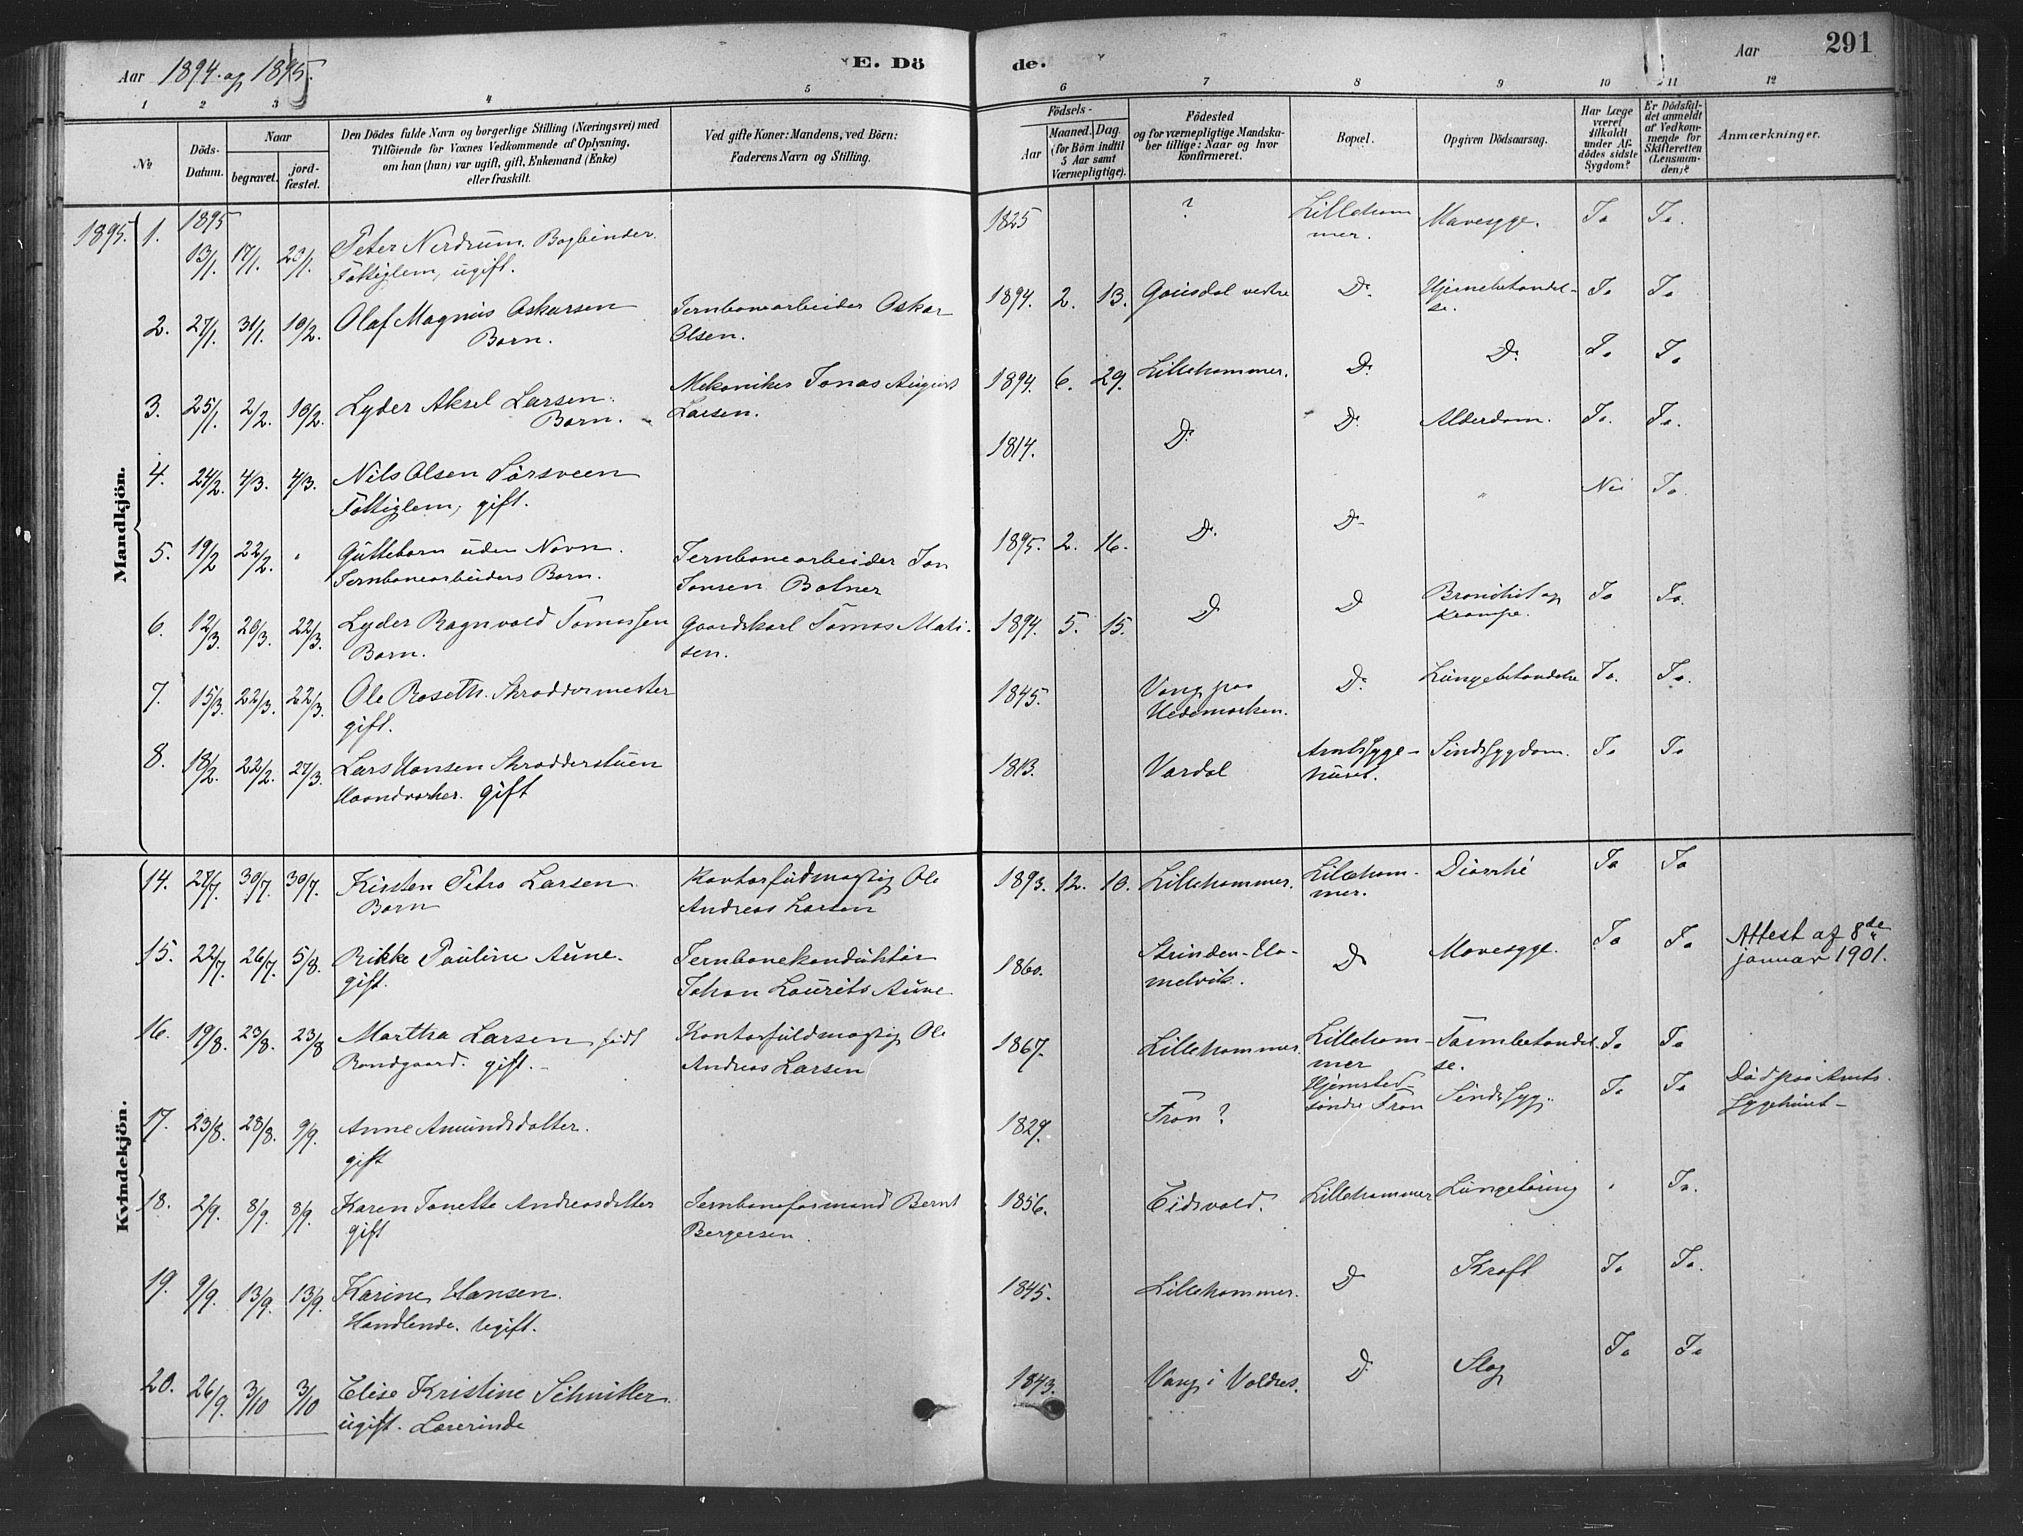 SAH, Fåberg prestekontor, Ministerialbok nr. 10, 1879-1900, s. 291